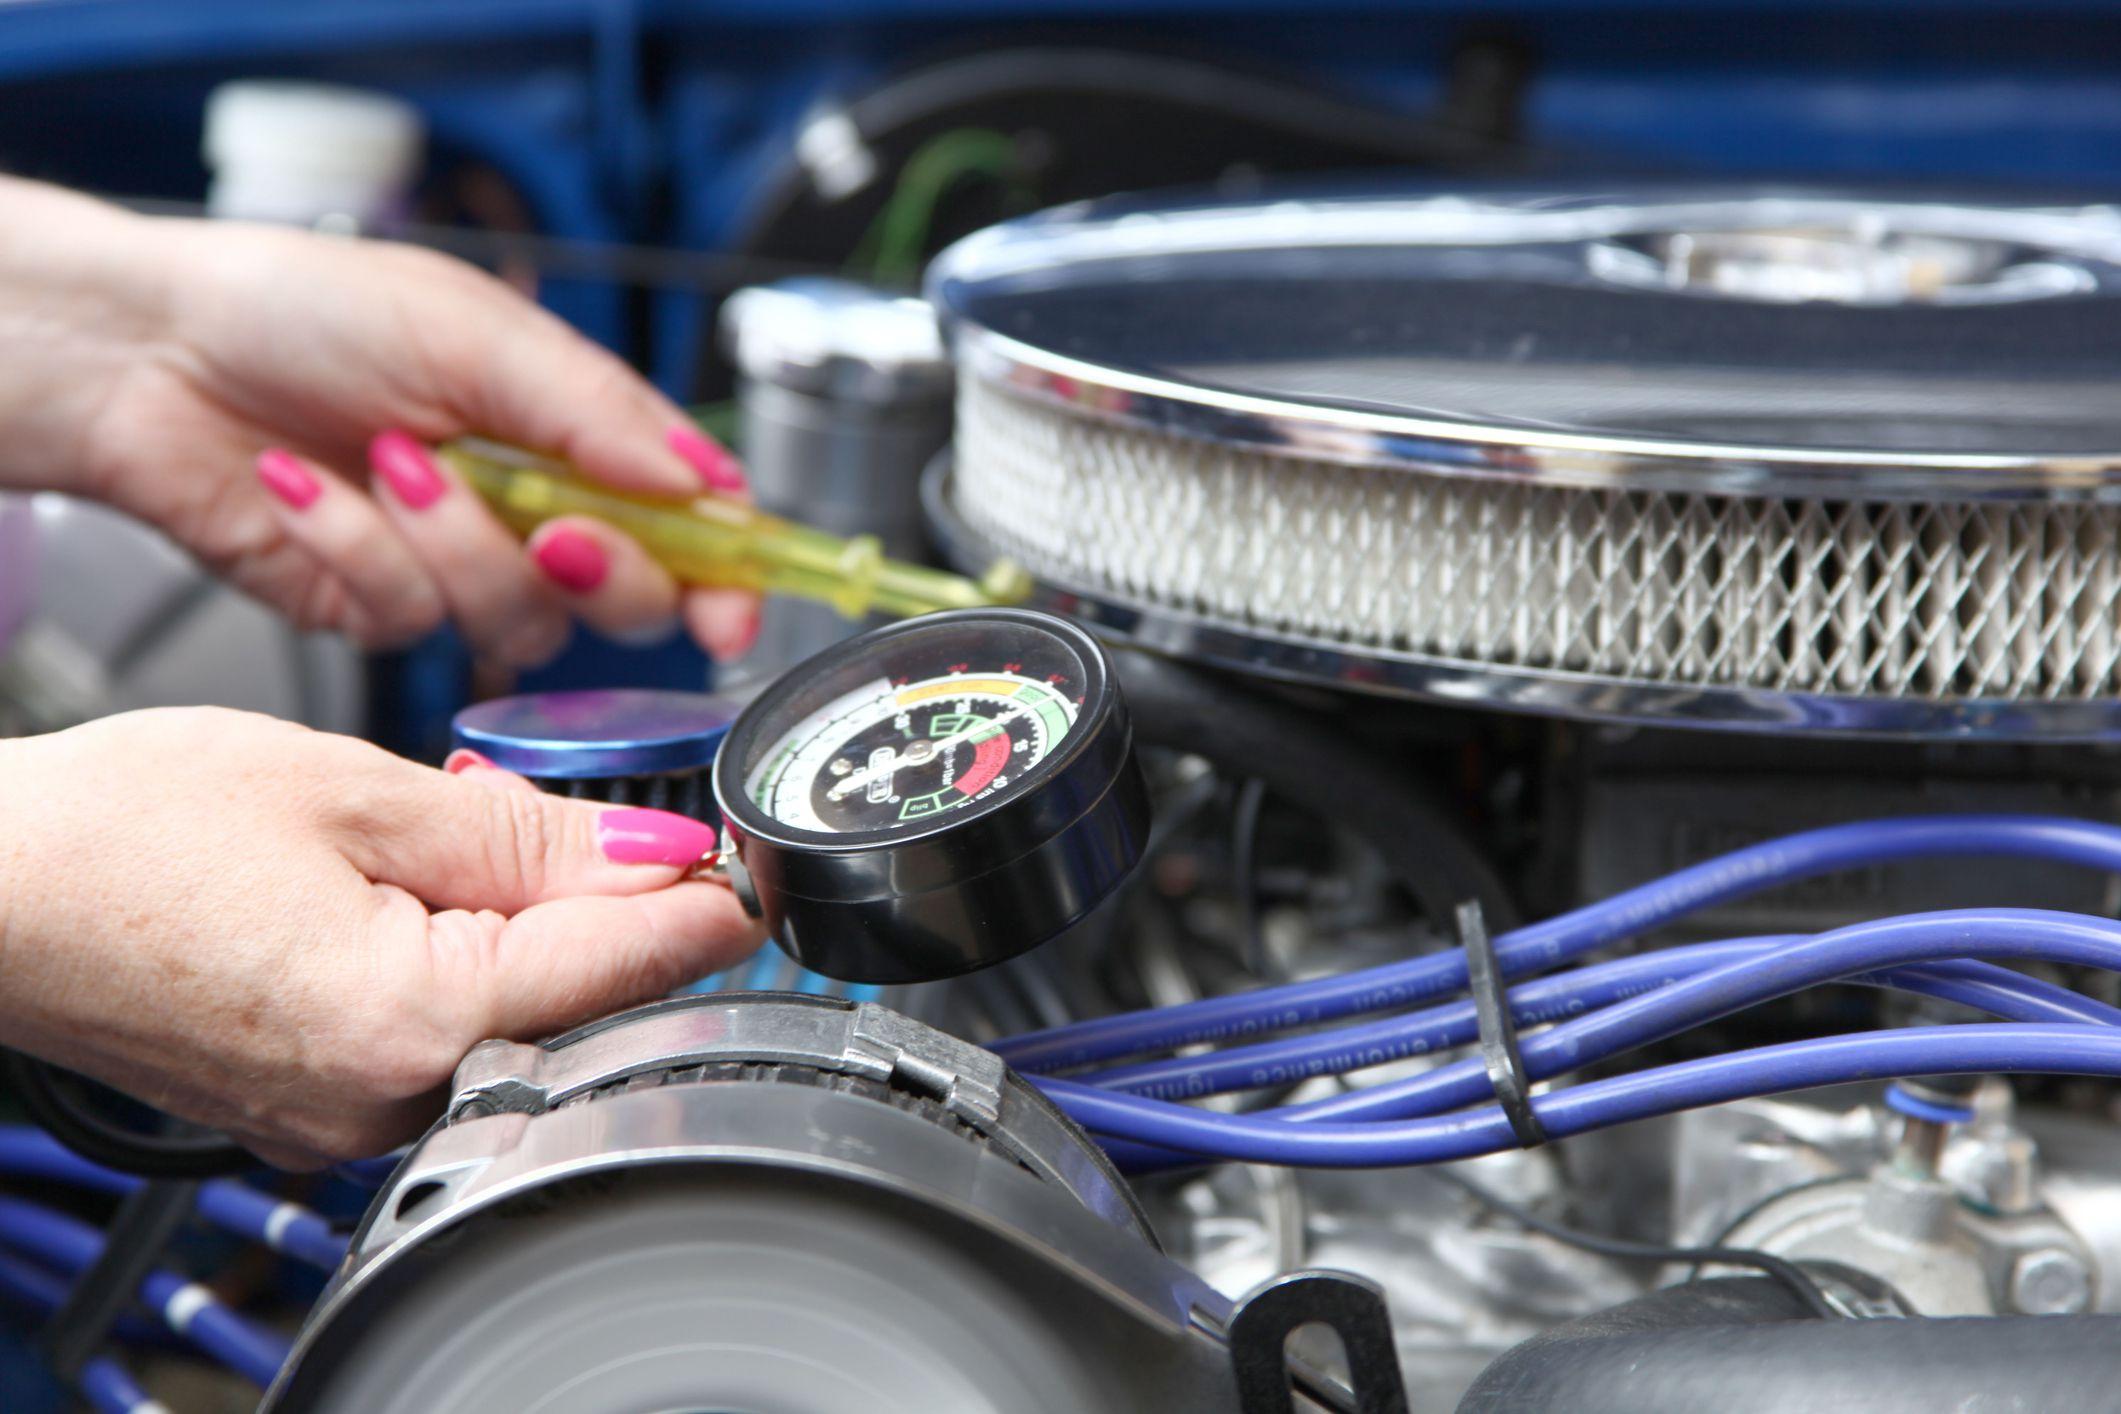 280z Fuel Filter Engine Vacuum Leak Symptoms And Solutions